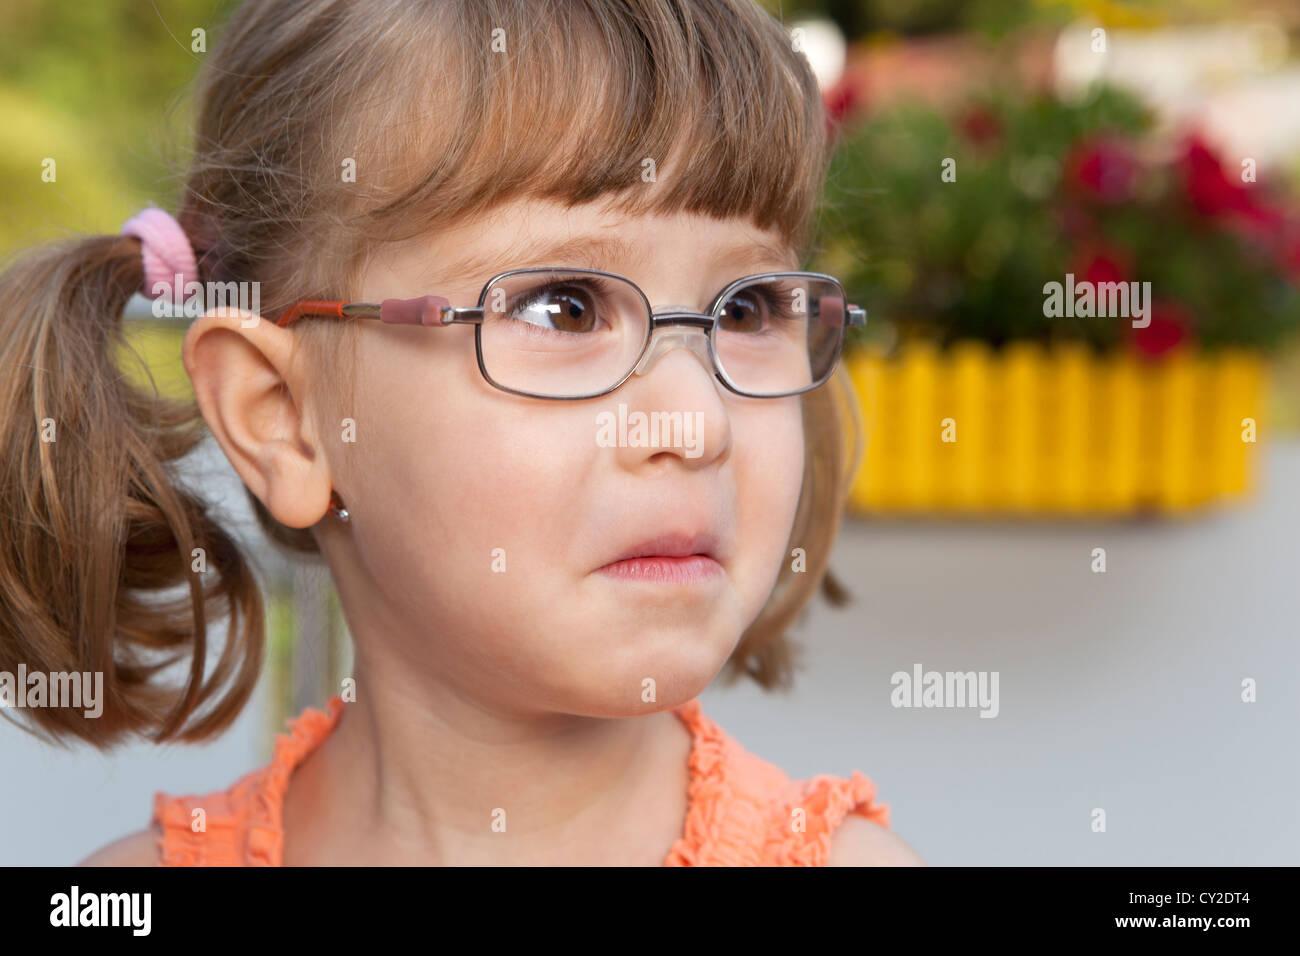 Little girl starts crying Stock Photo